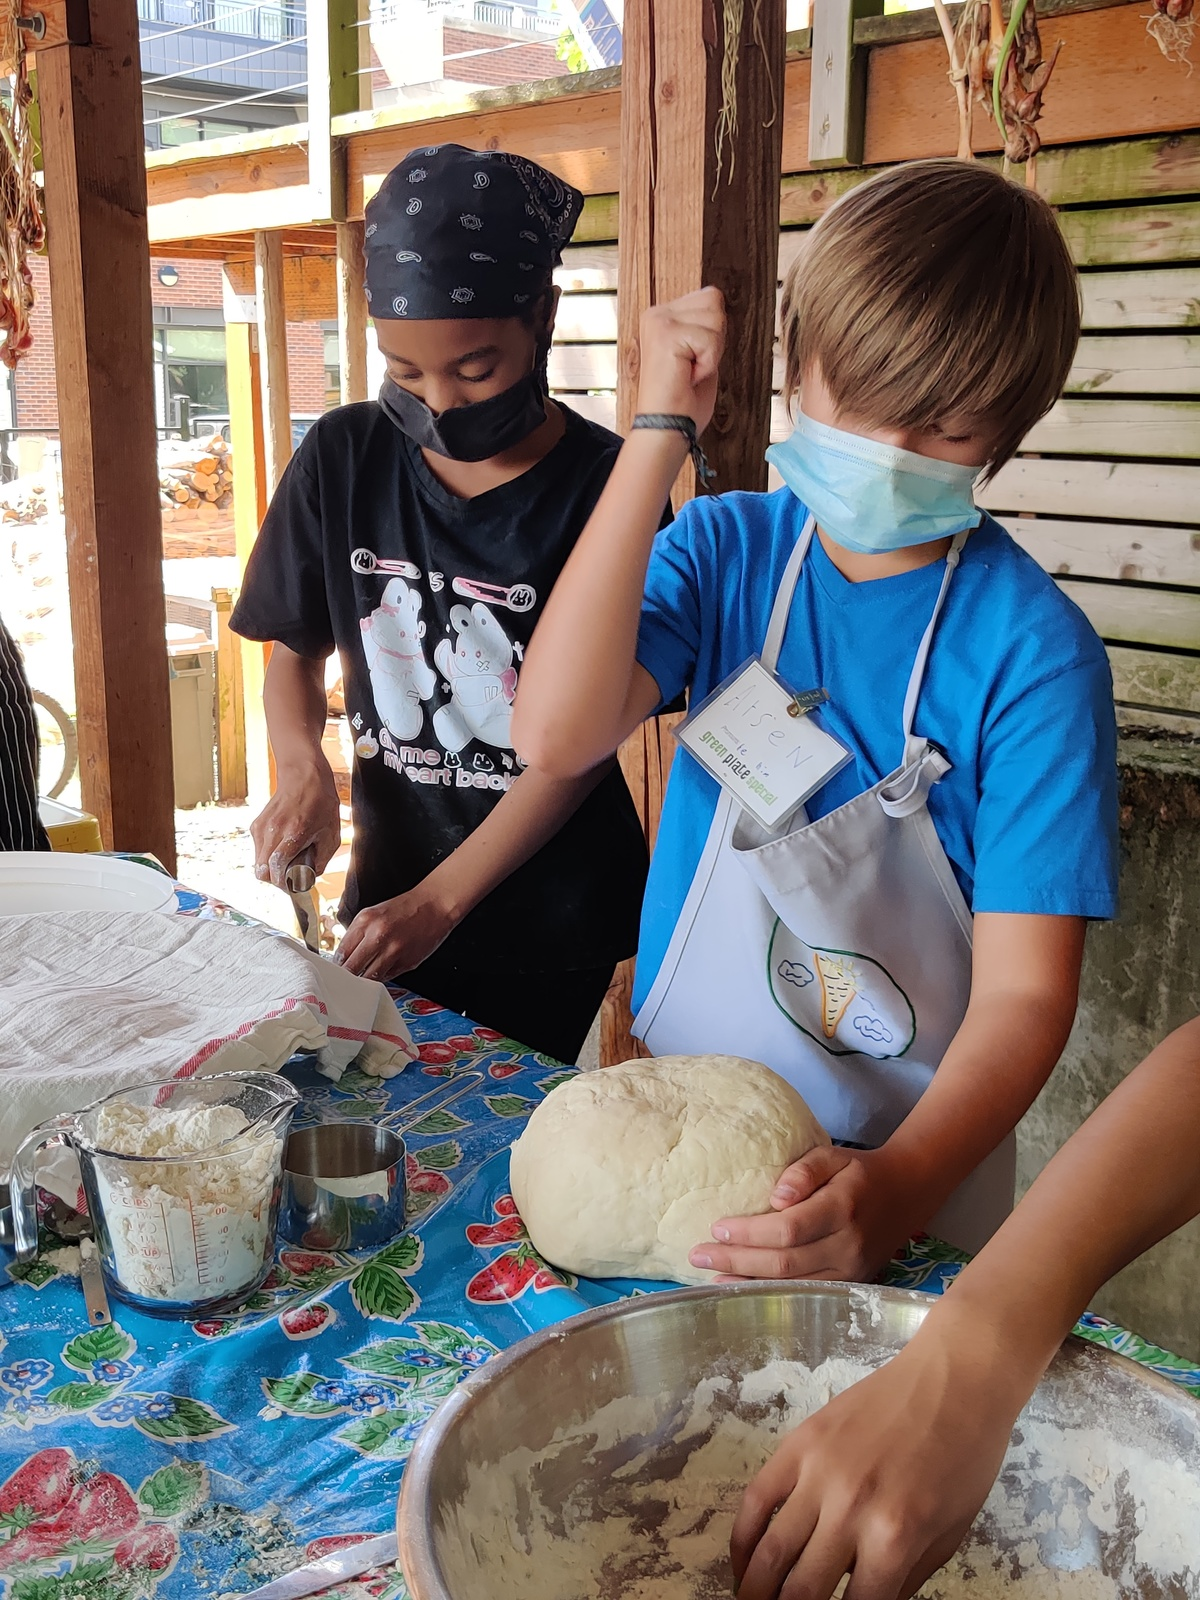 two youth making dumplings.